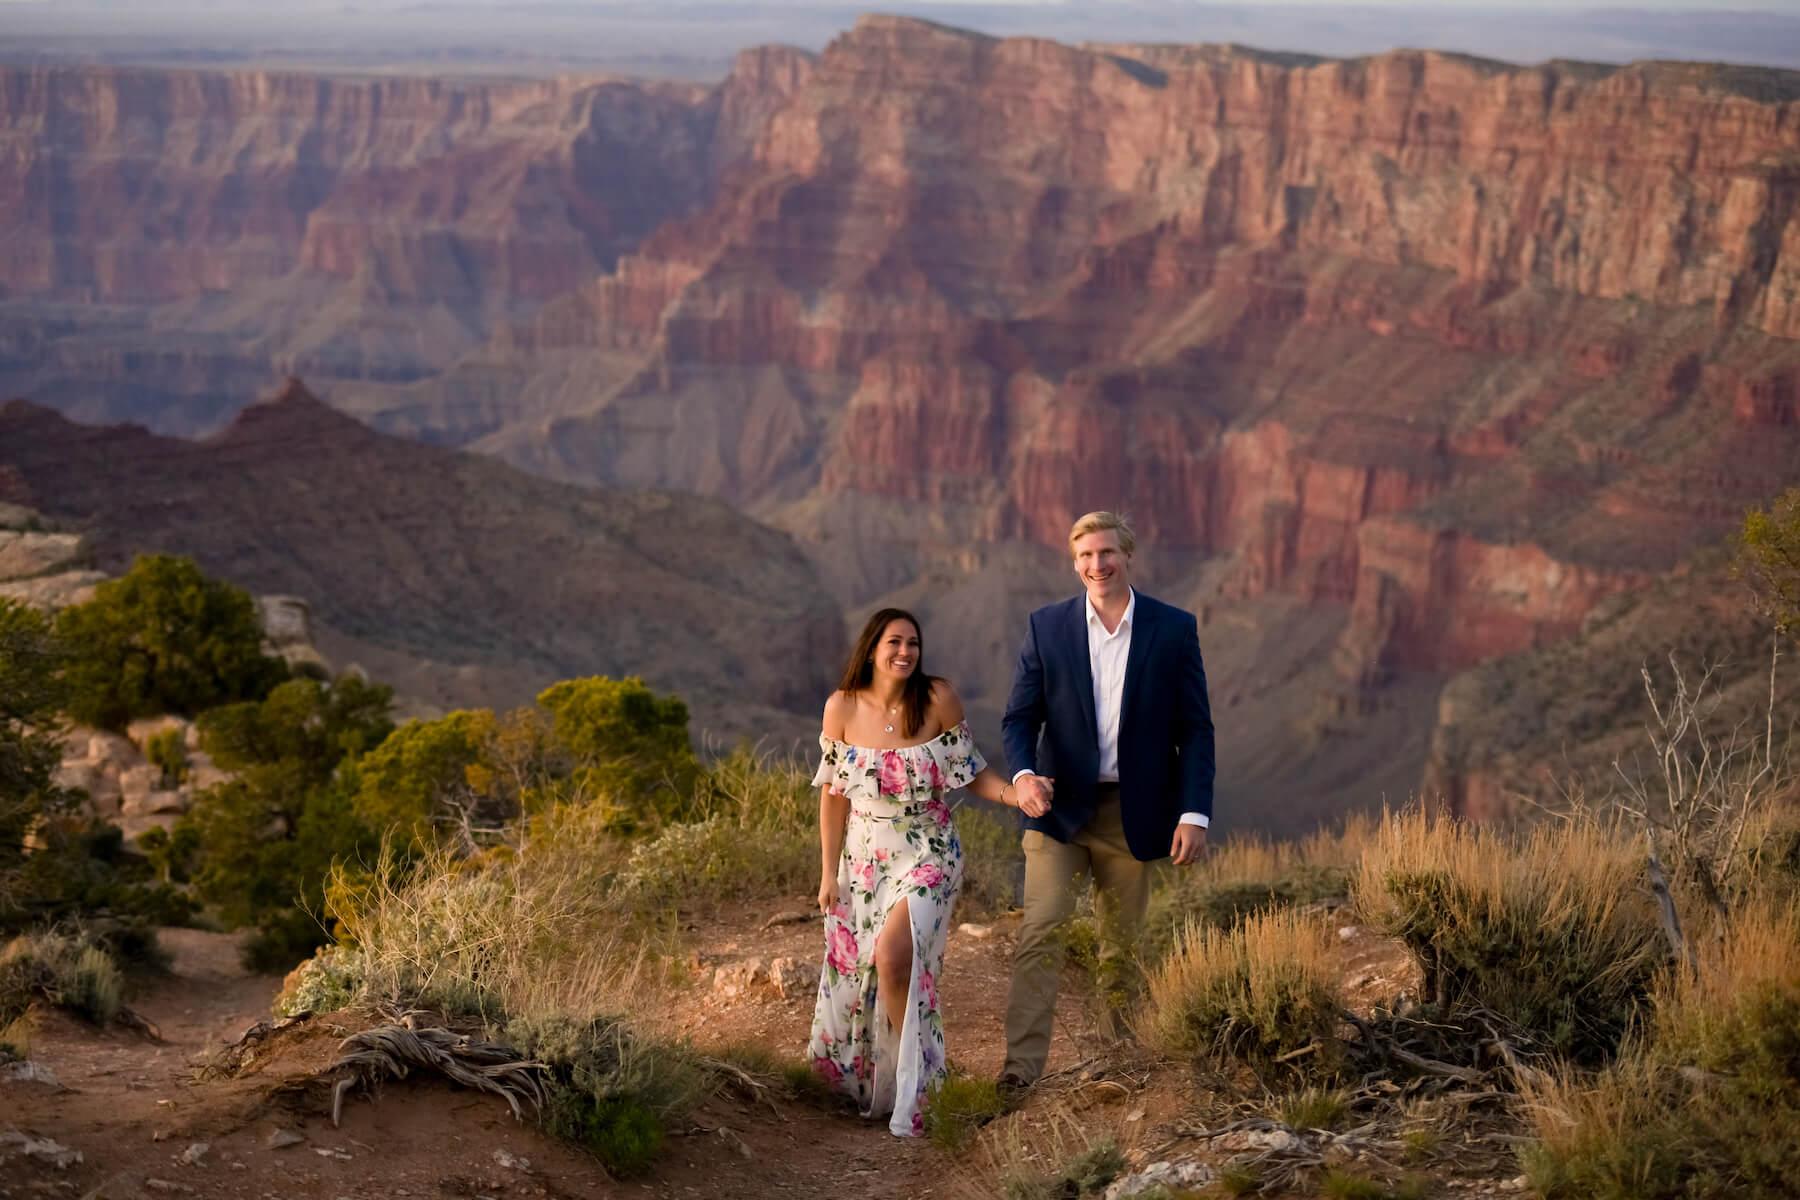 grand-canyon-06-14-2020-birthday-35_original